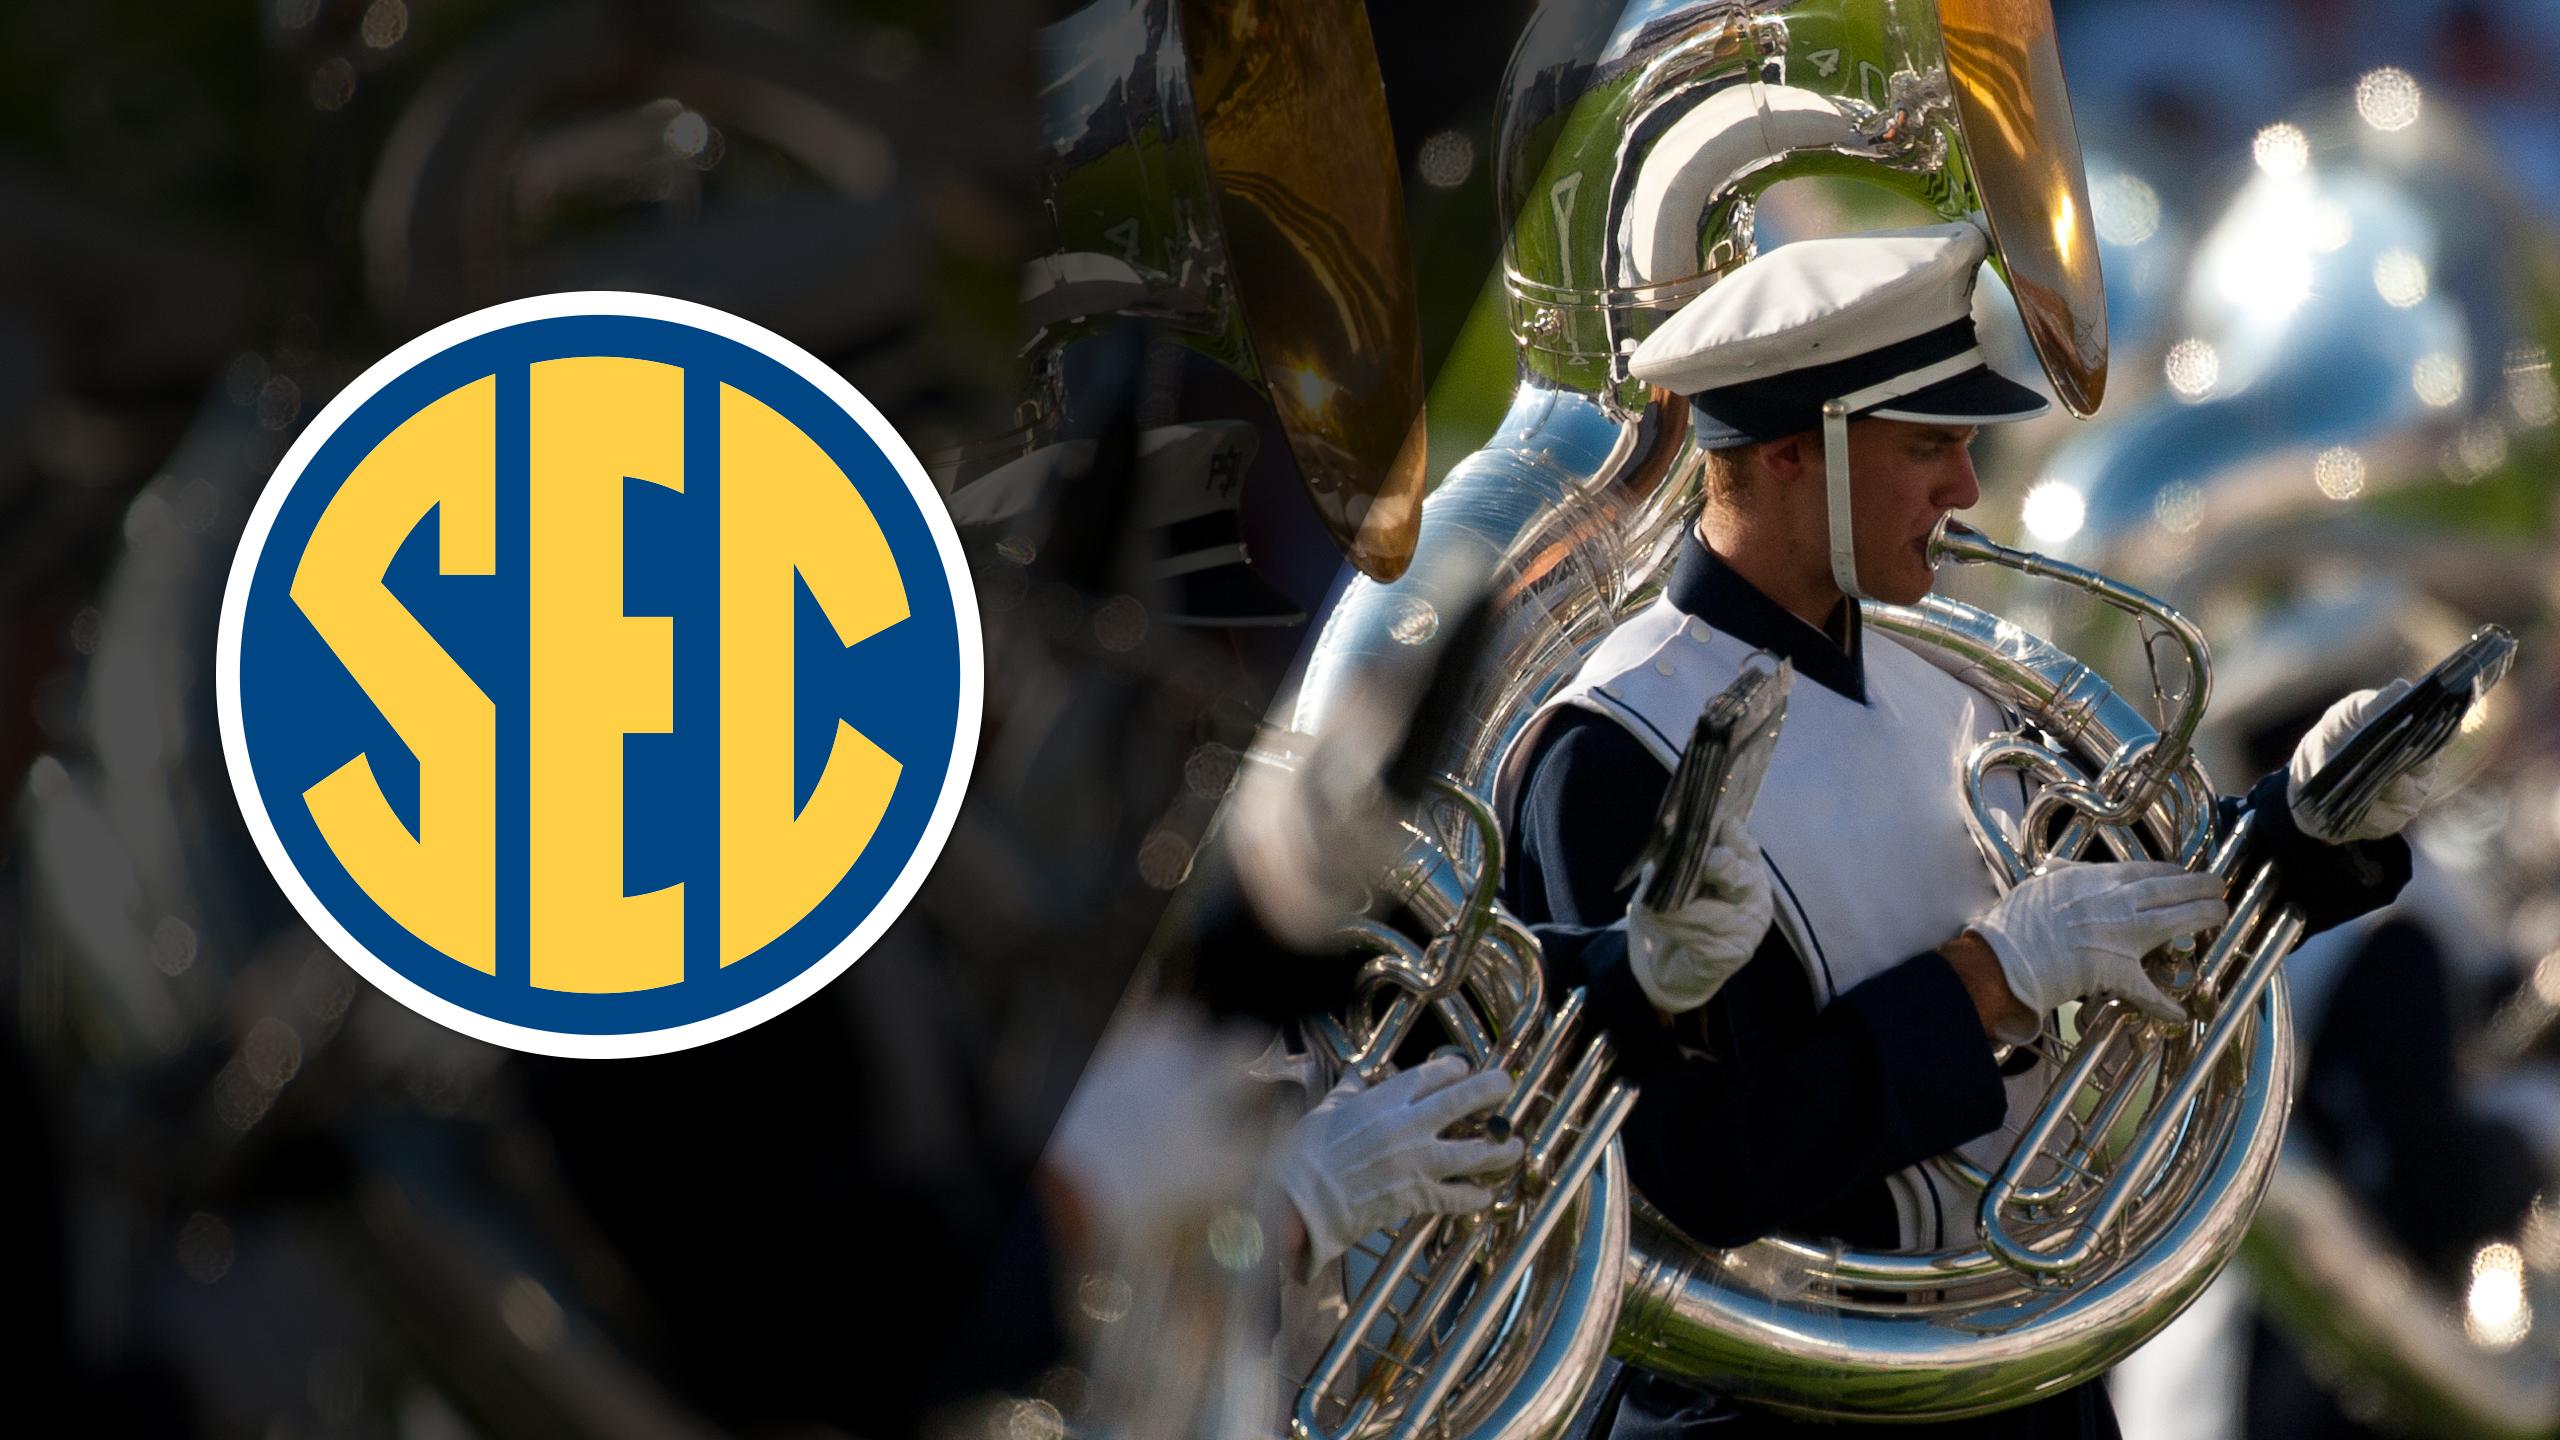 SEC Halftime Band Performances at Auburn